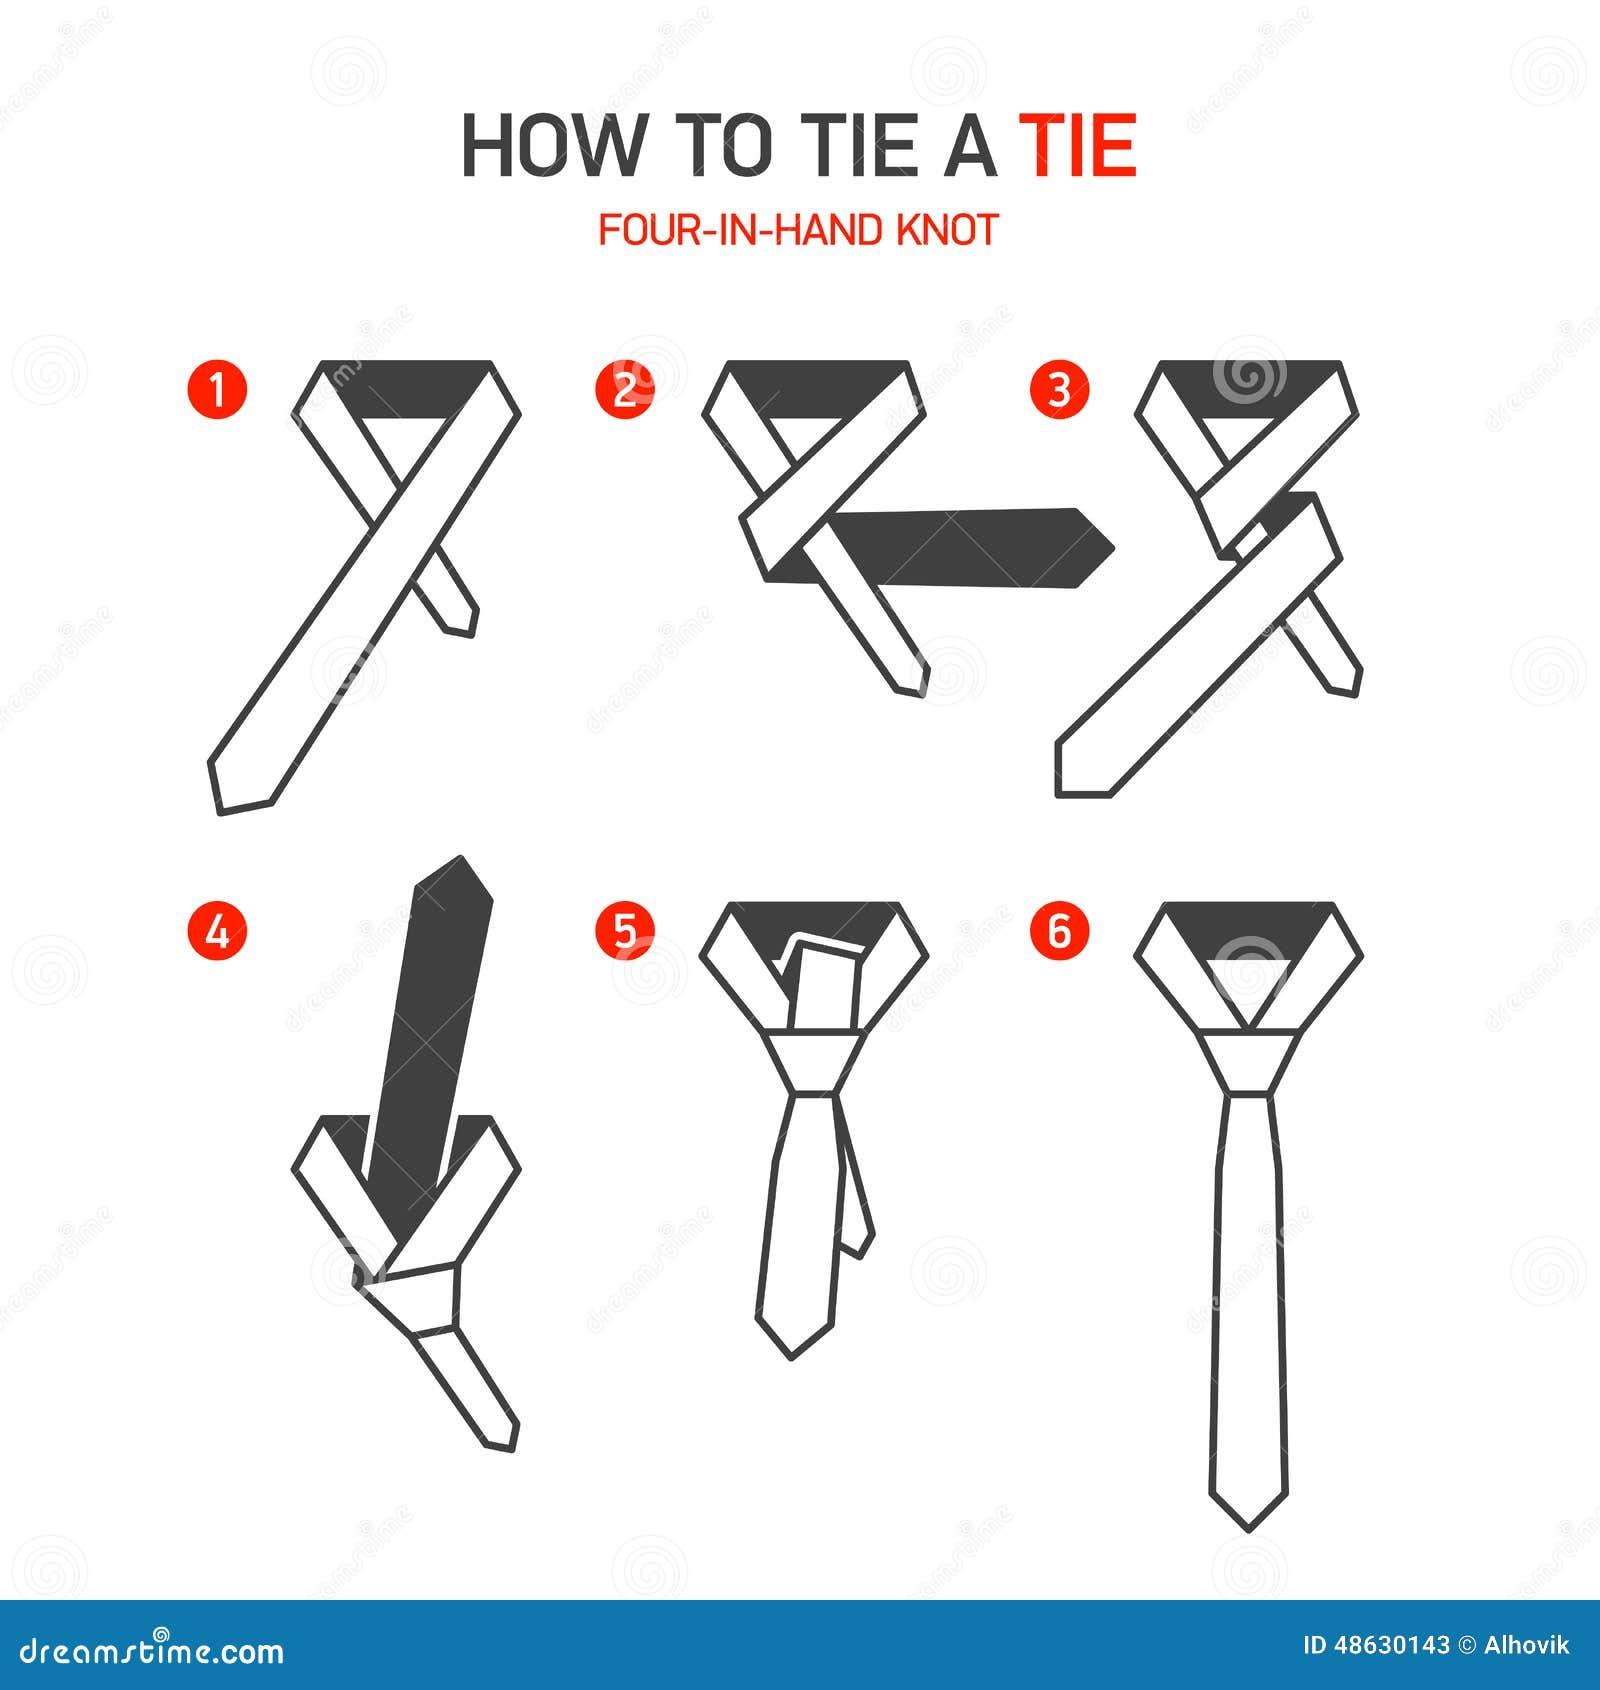 4 steps in explicit instruction